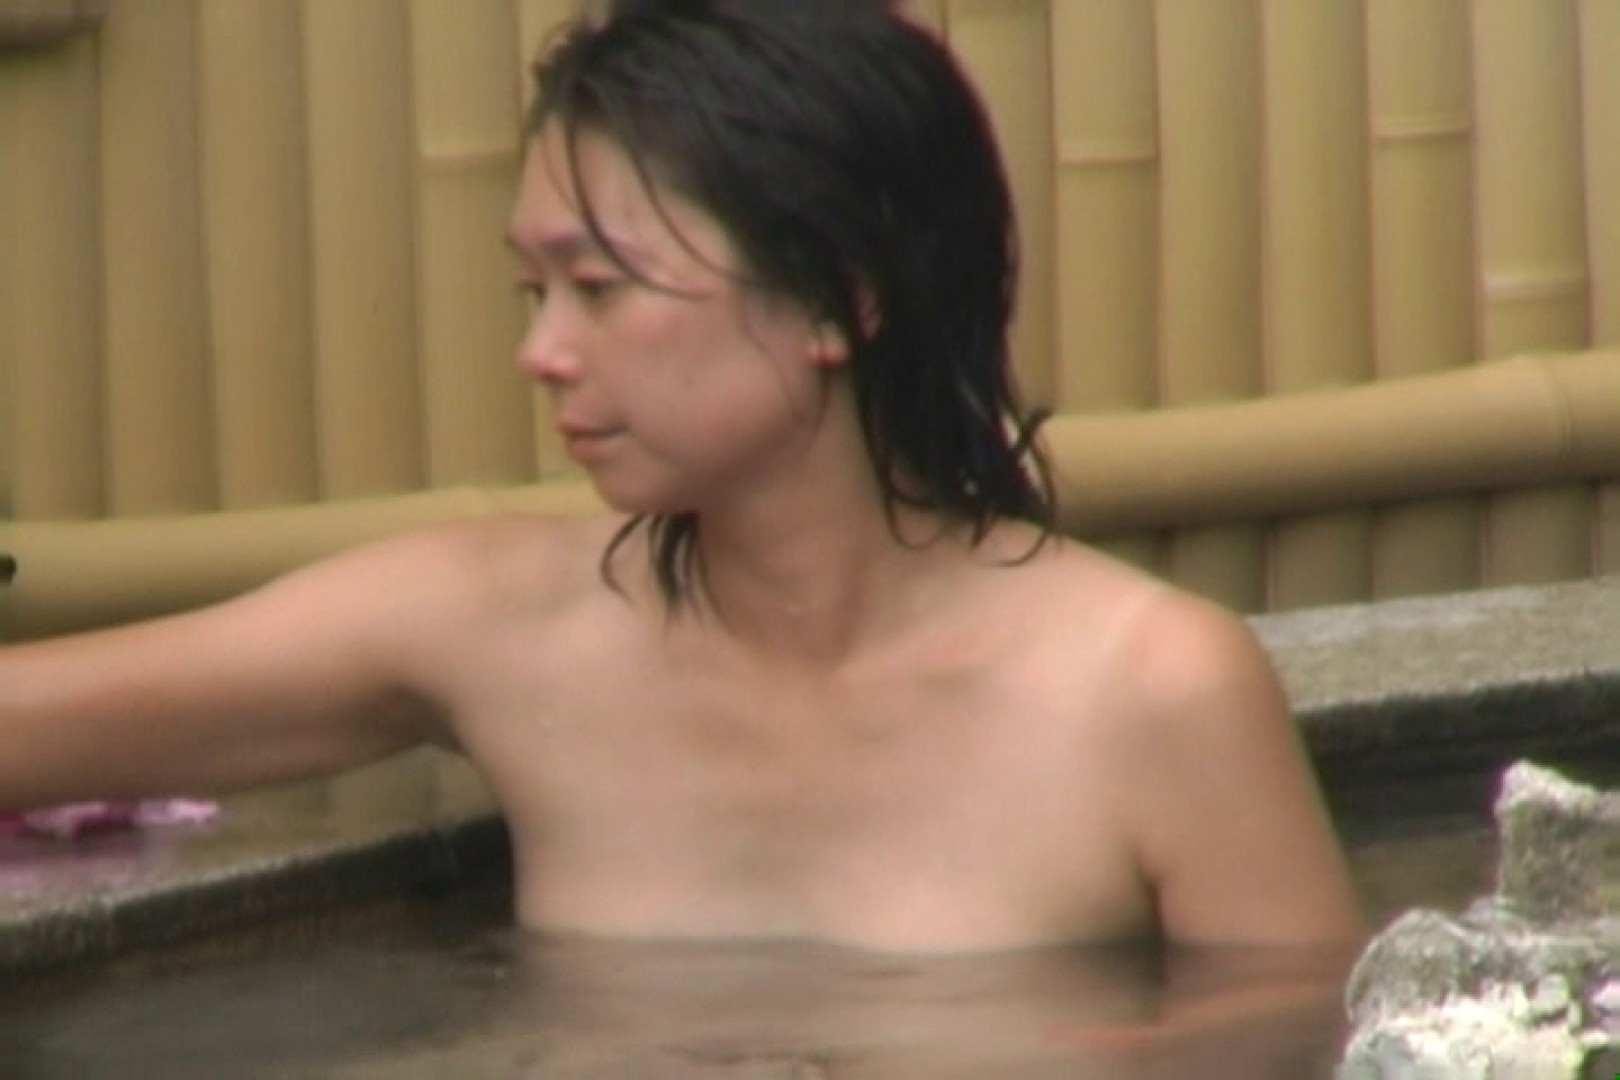 Aquaな露天風呂Vol.619 エッチな盗撮 ワレメ無修正動画無料 107pic 88